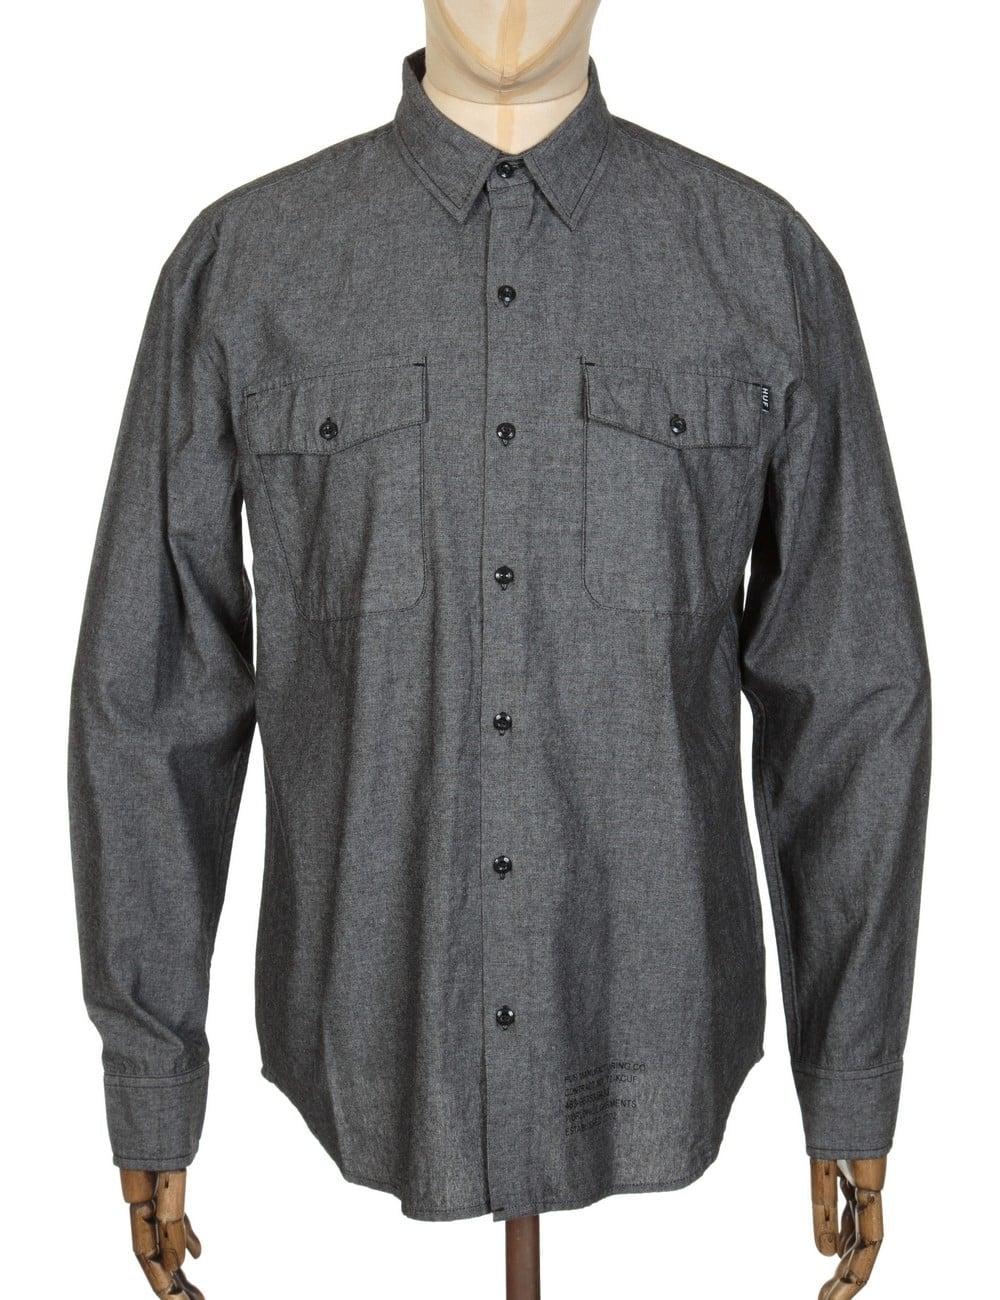 30c2c987ca14 Huf L/S MFG Chambray Shirt - Black - Shirts from Fat Buddha Store UK